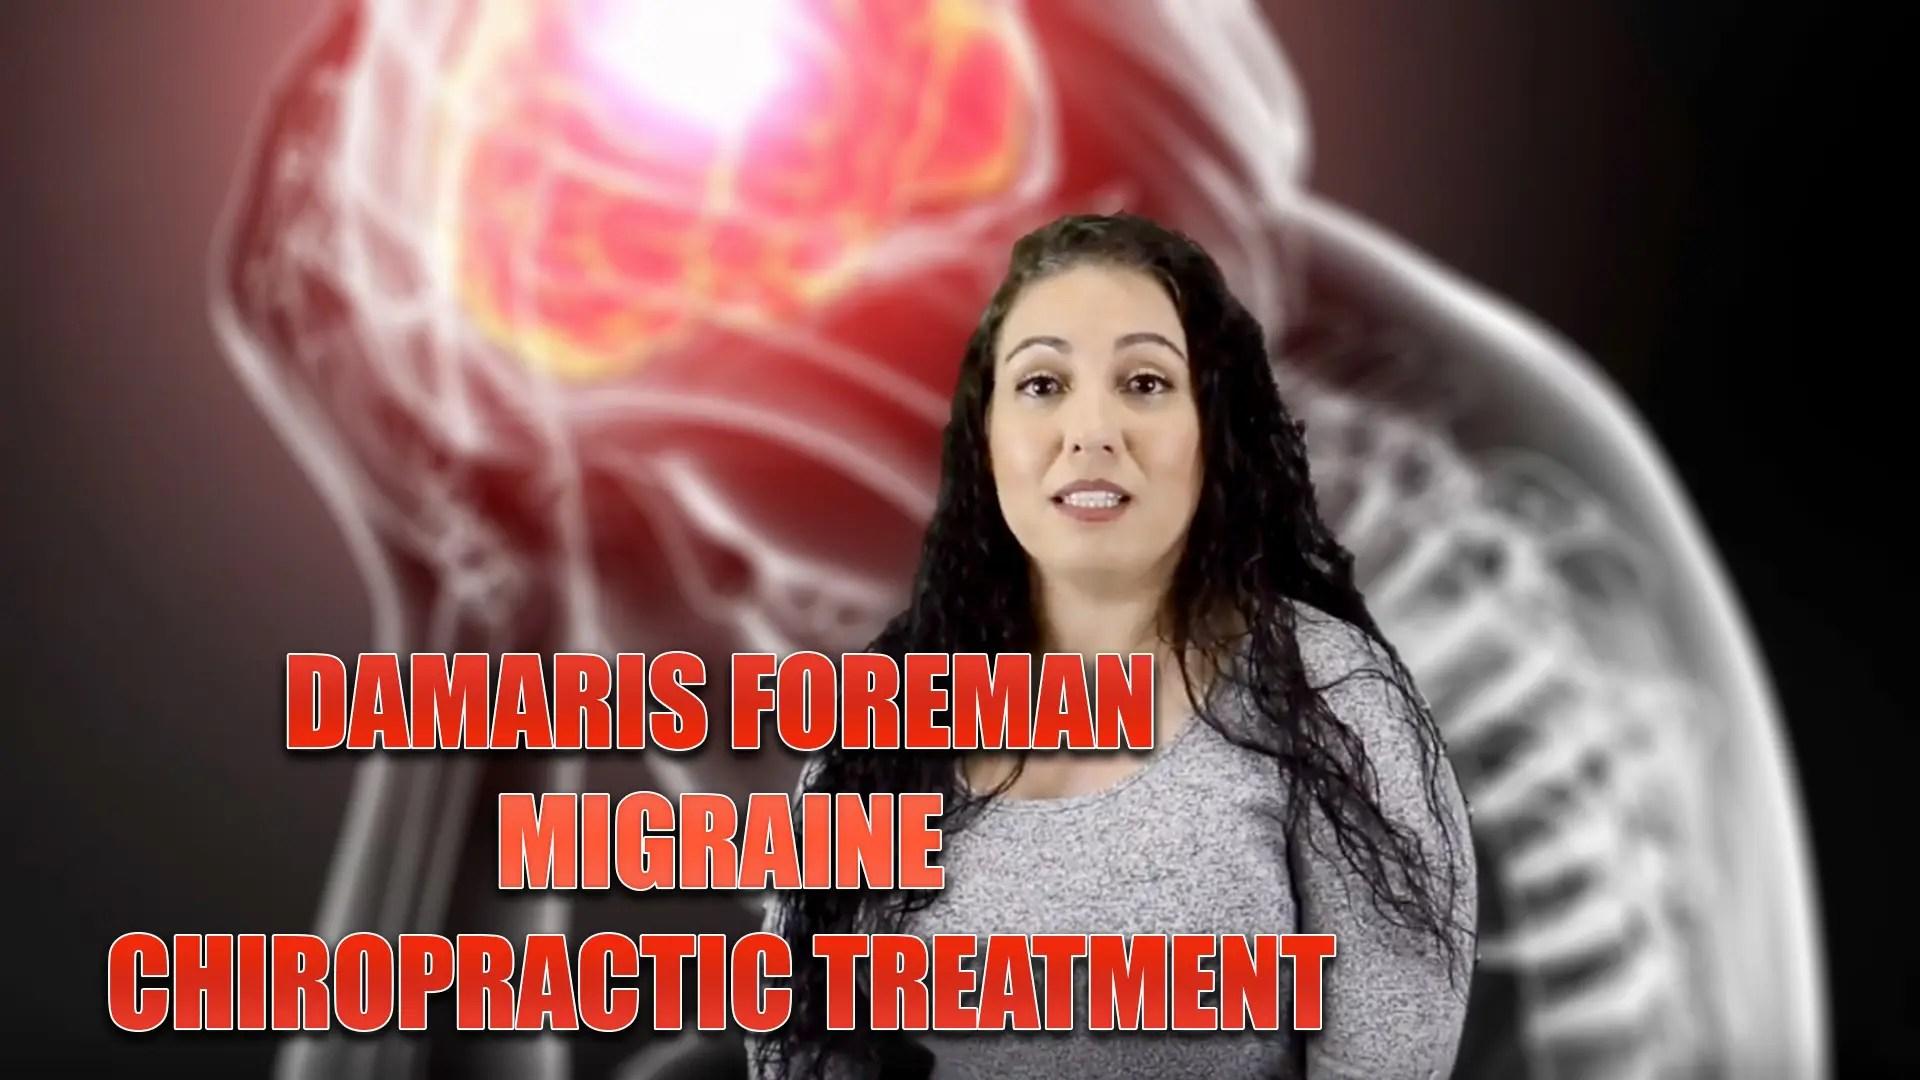 Migraine Chiropractic Treatment | Video